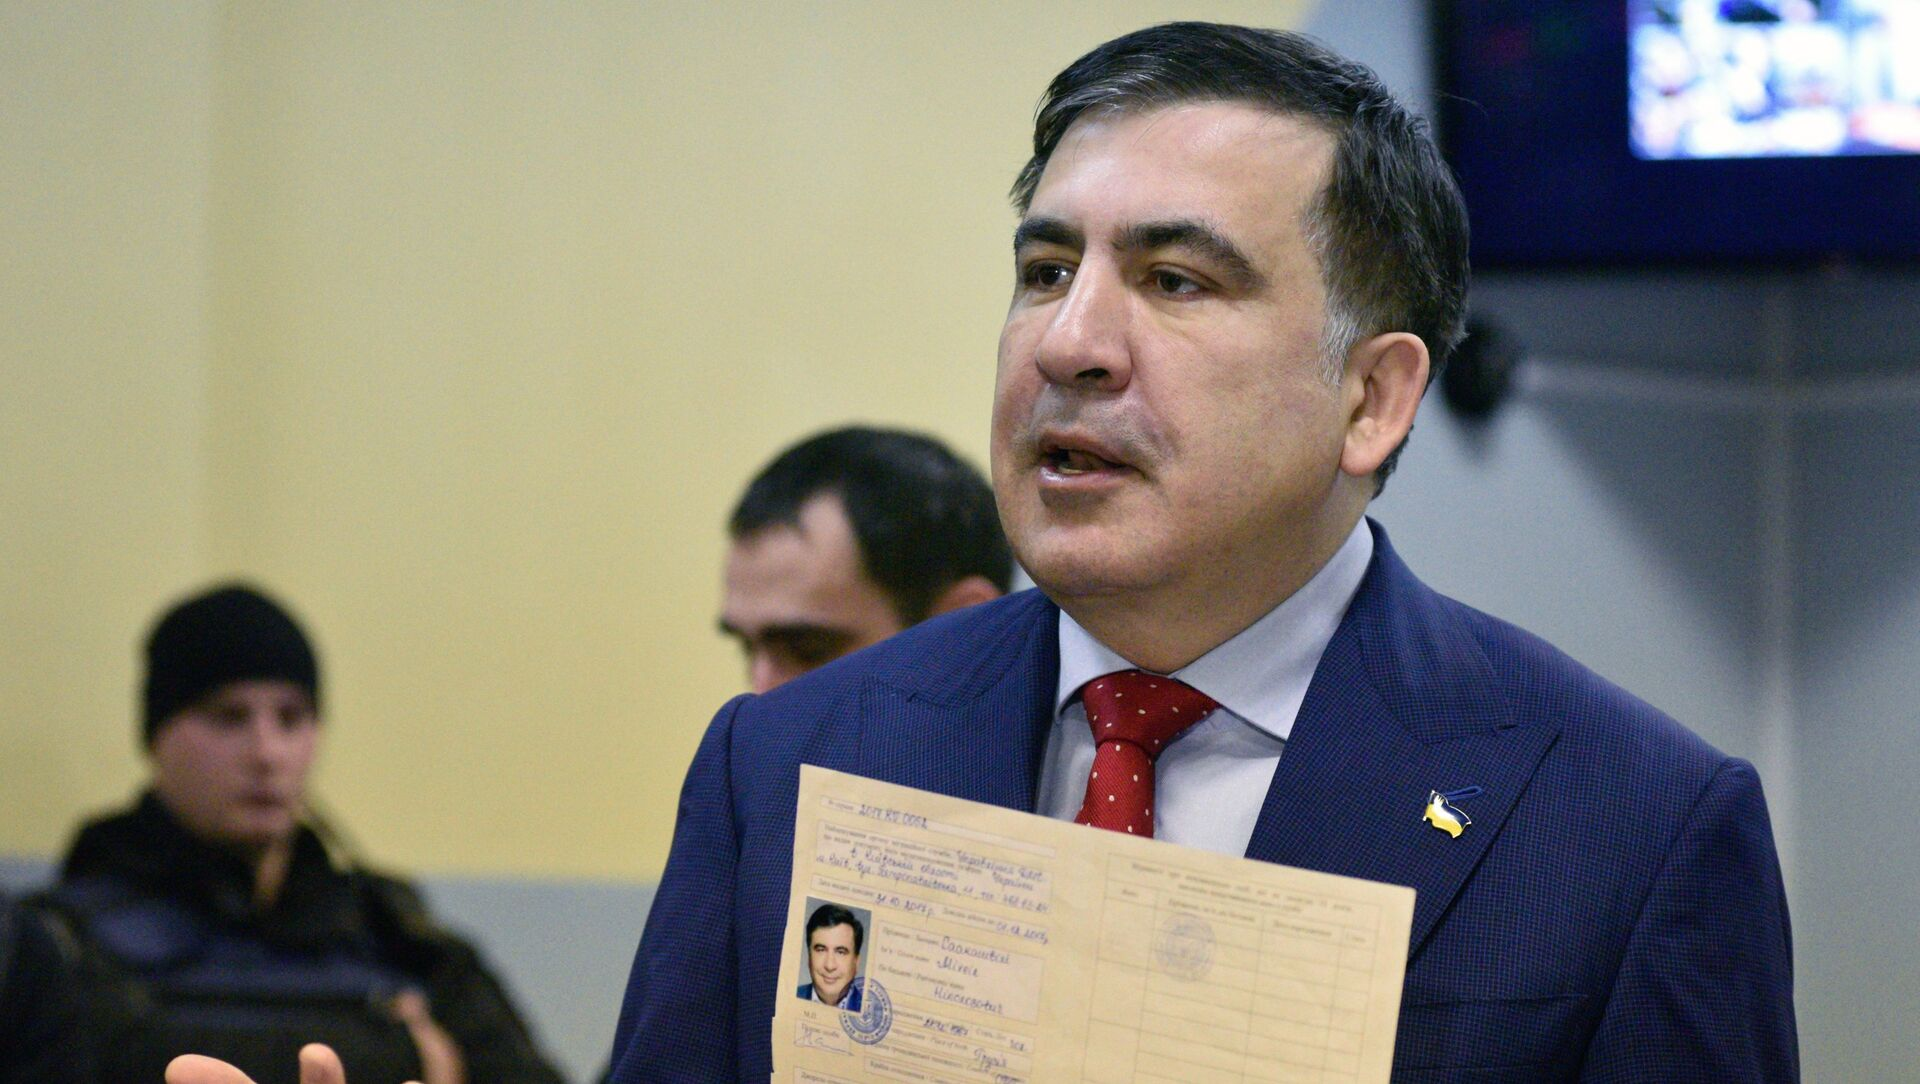 Суд над М. Саакашвили в Киеве - Sputnik Абхазия, 1920, 01.10.2021